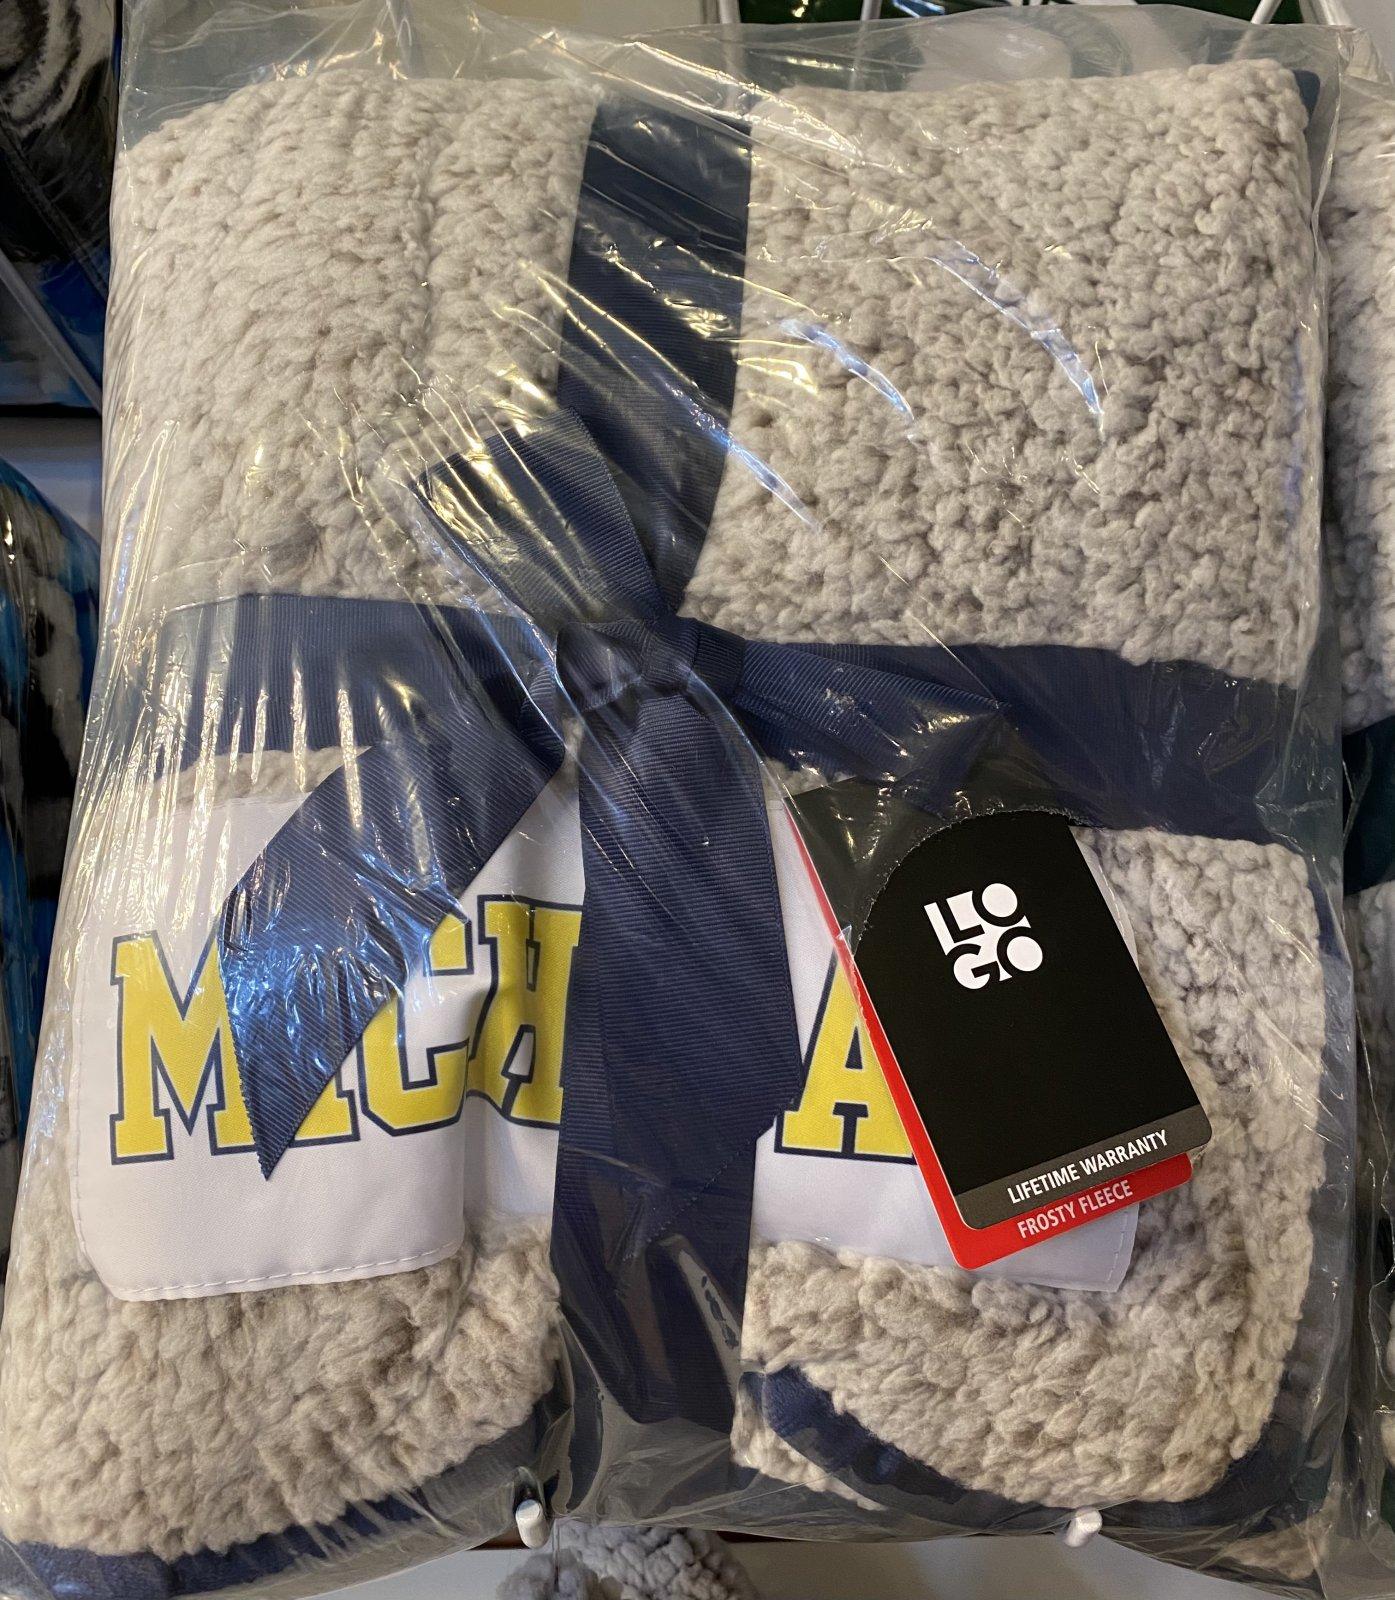 U of M Wolverines Frosty Freeze Blanket